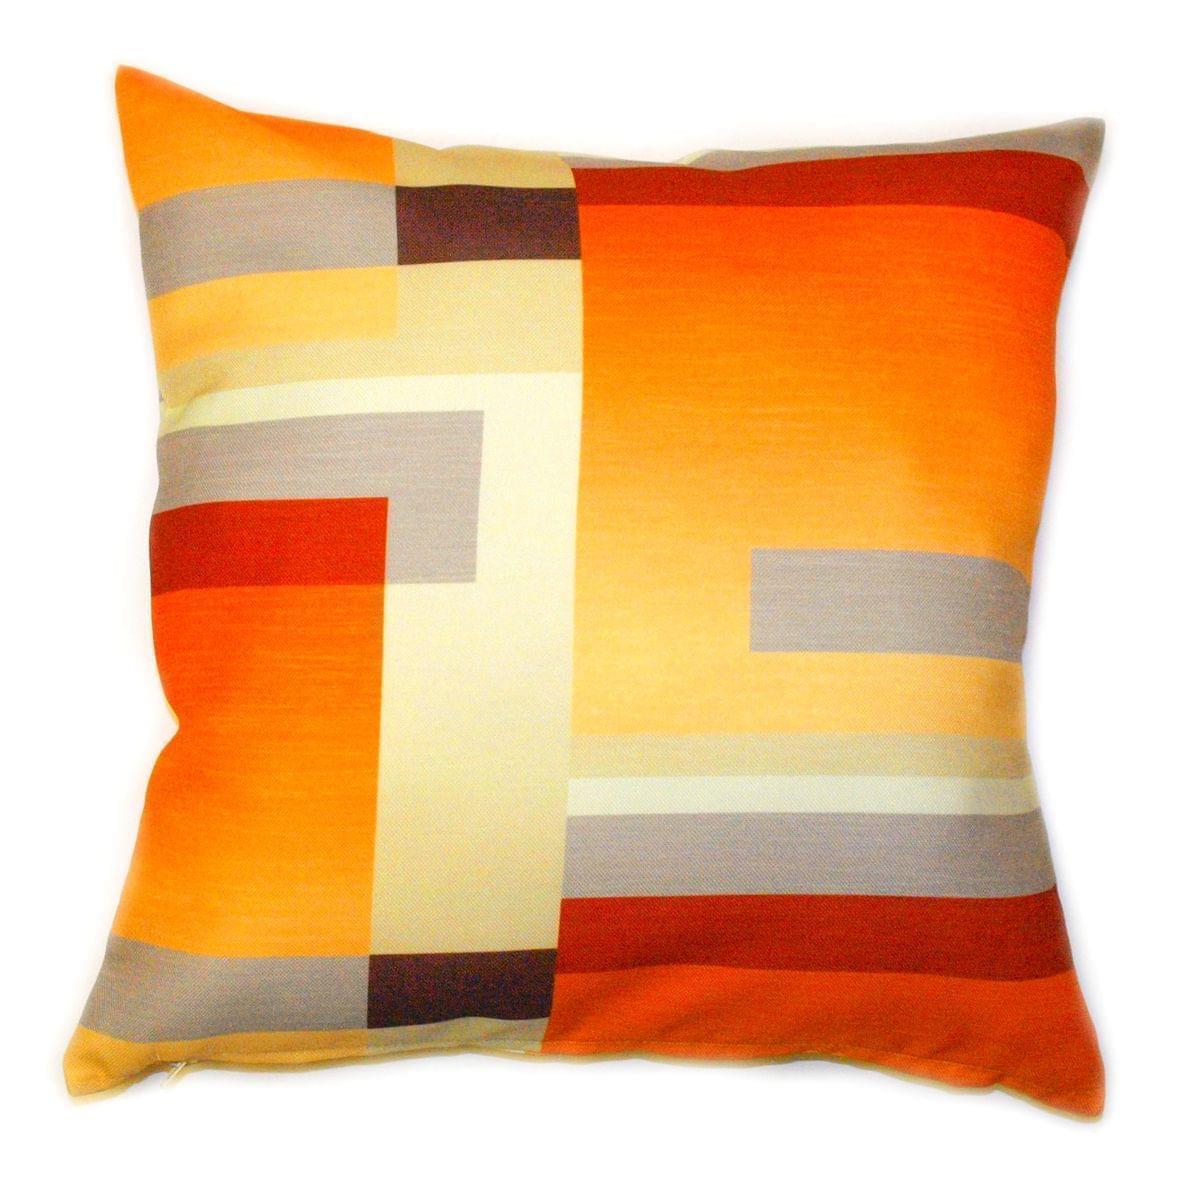 Forbyt, Návlek na polštář, OXY Stripes oranžovočervený, 45 x 45 cm